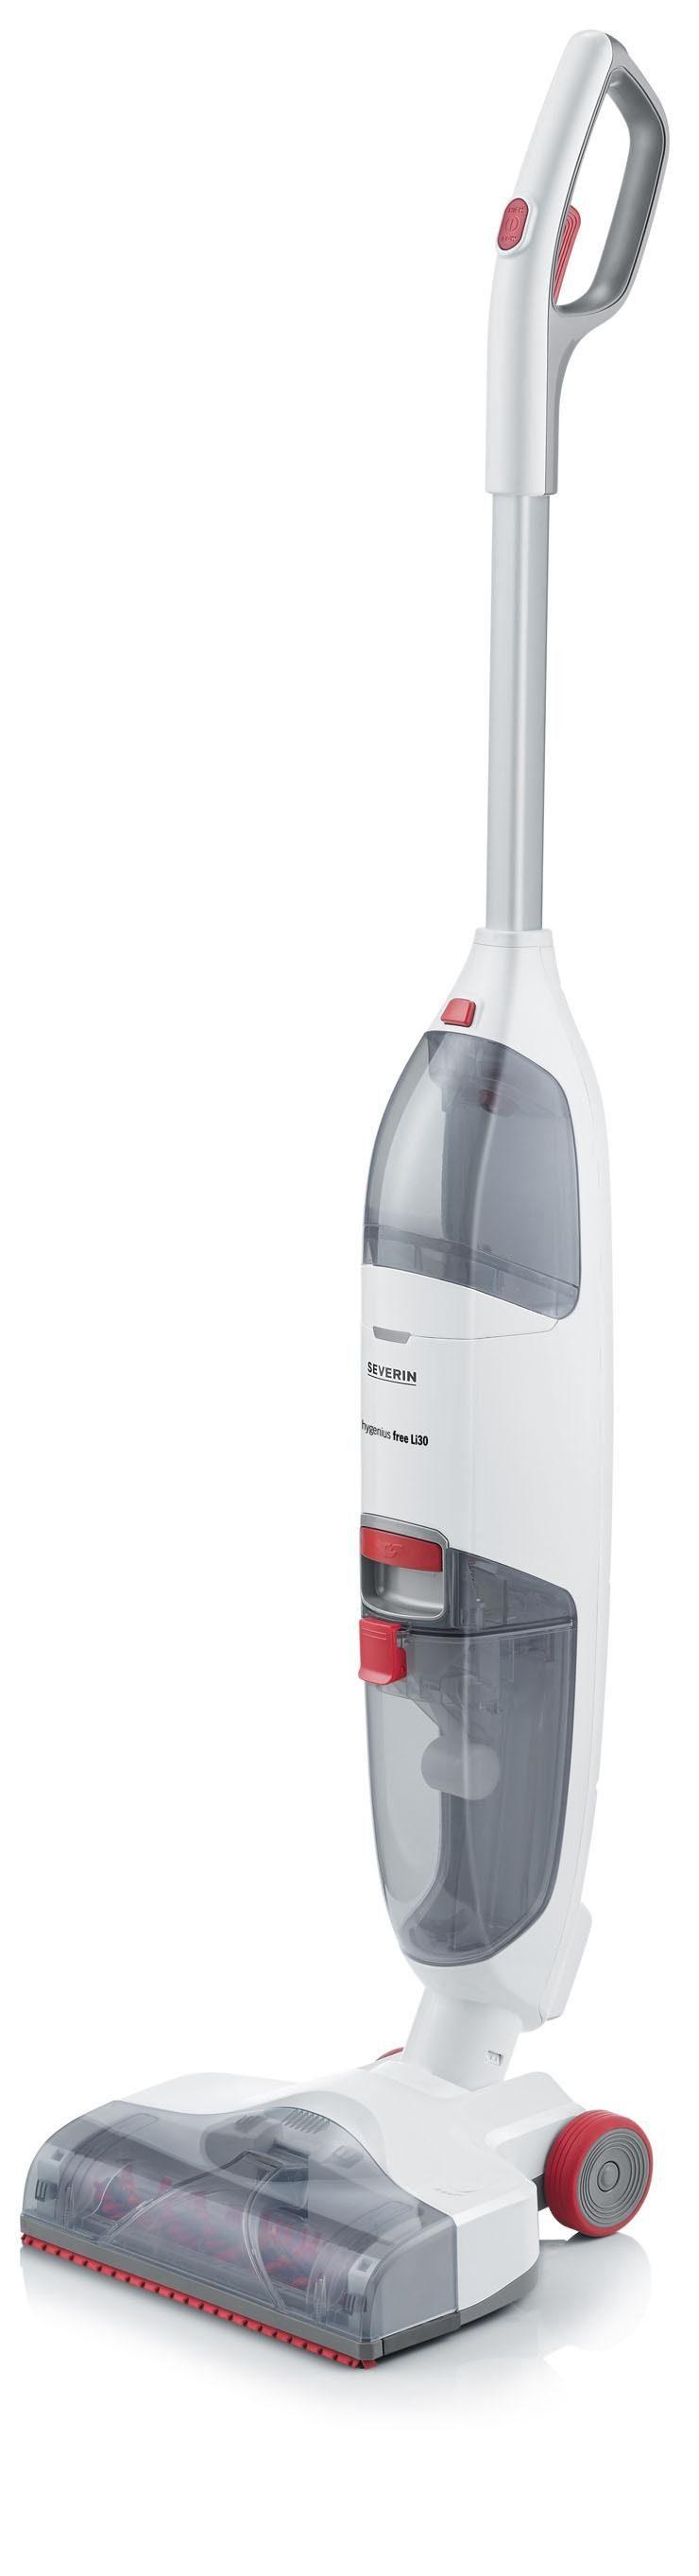 Severin Nass-Trocken-Sauger SC 7148 Hygenius Free Li30, 900 Watt, beutellos